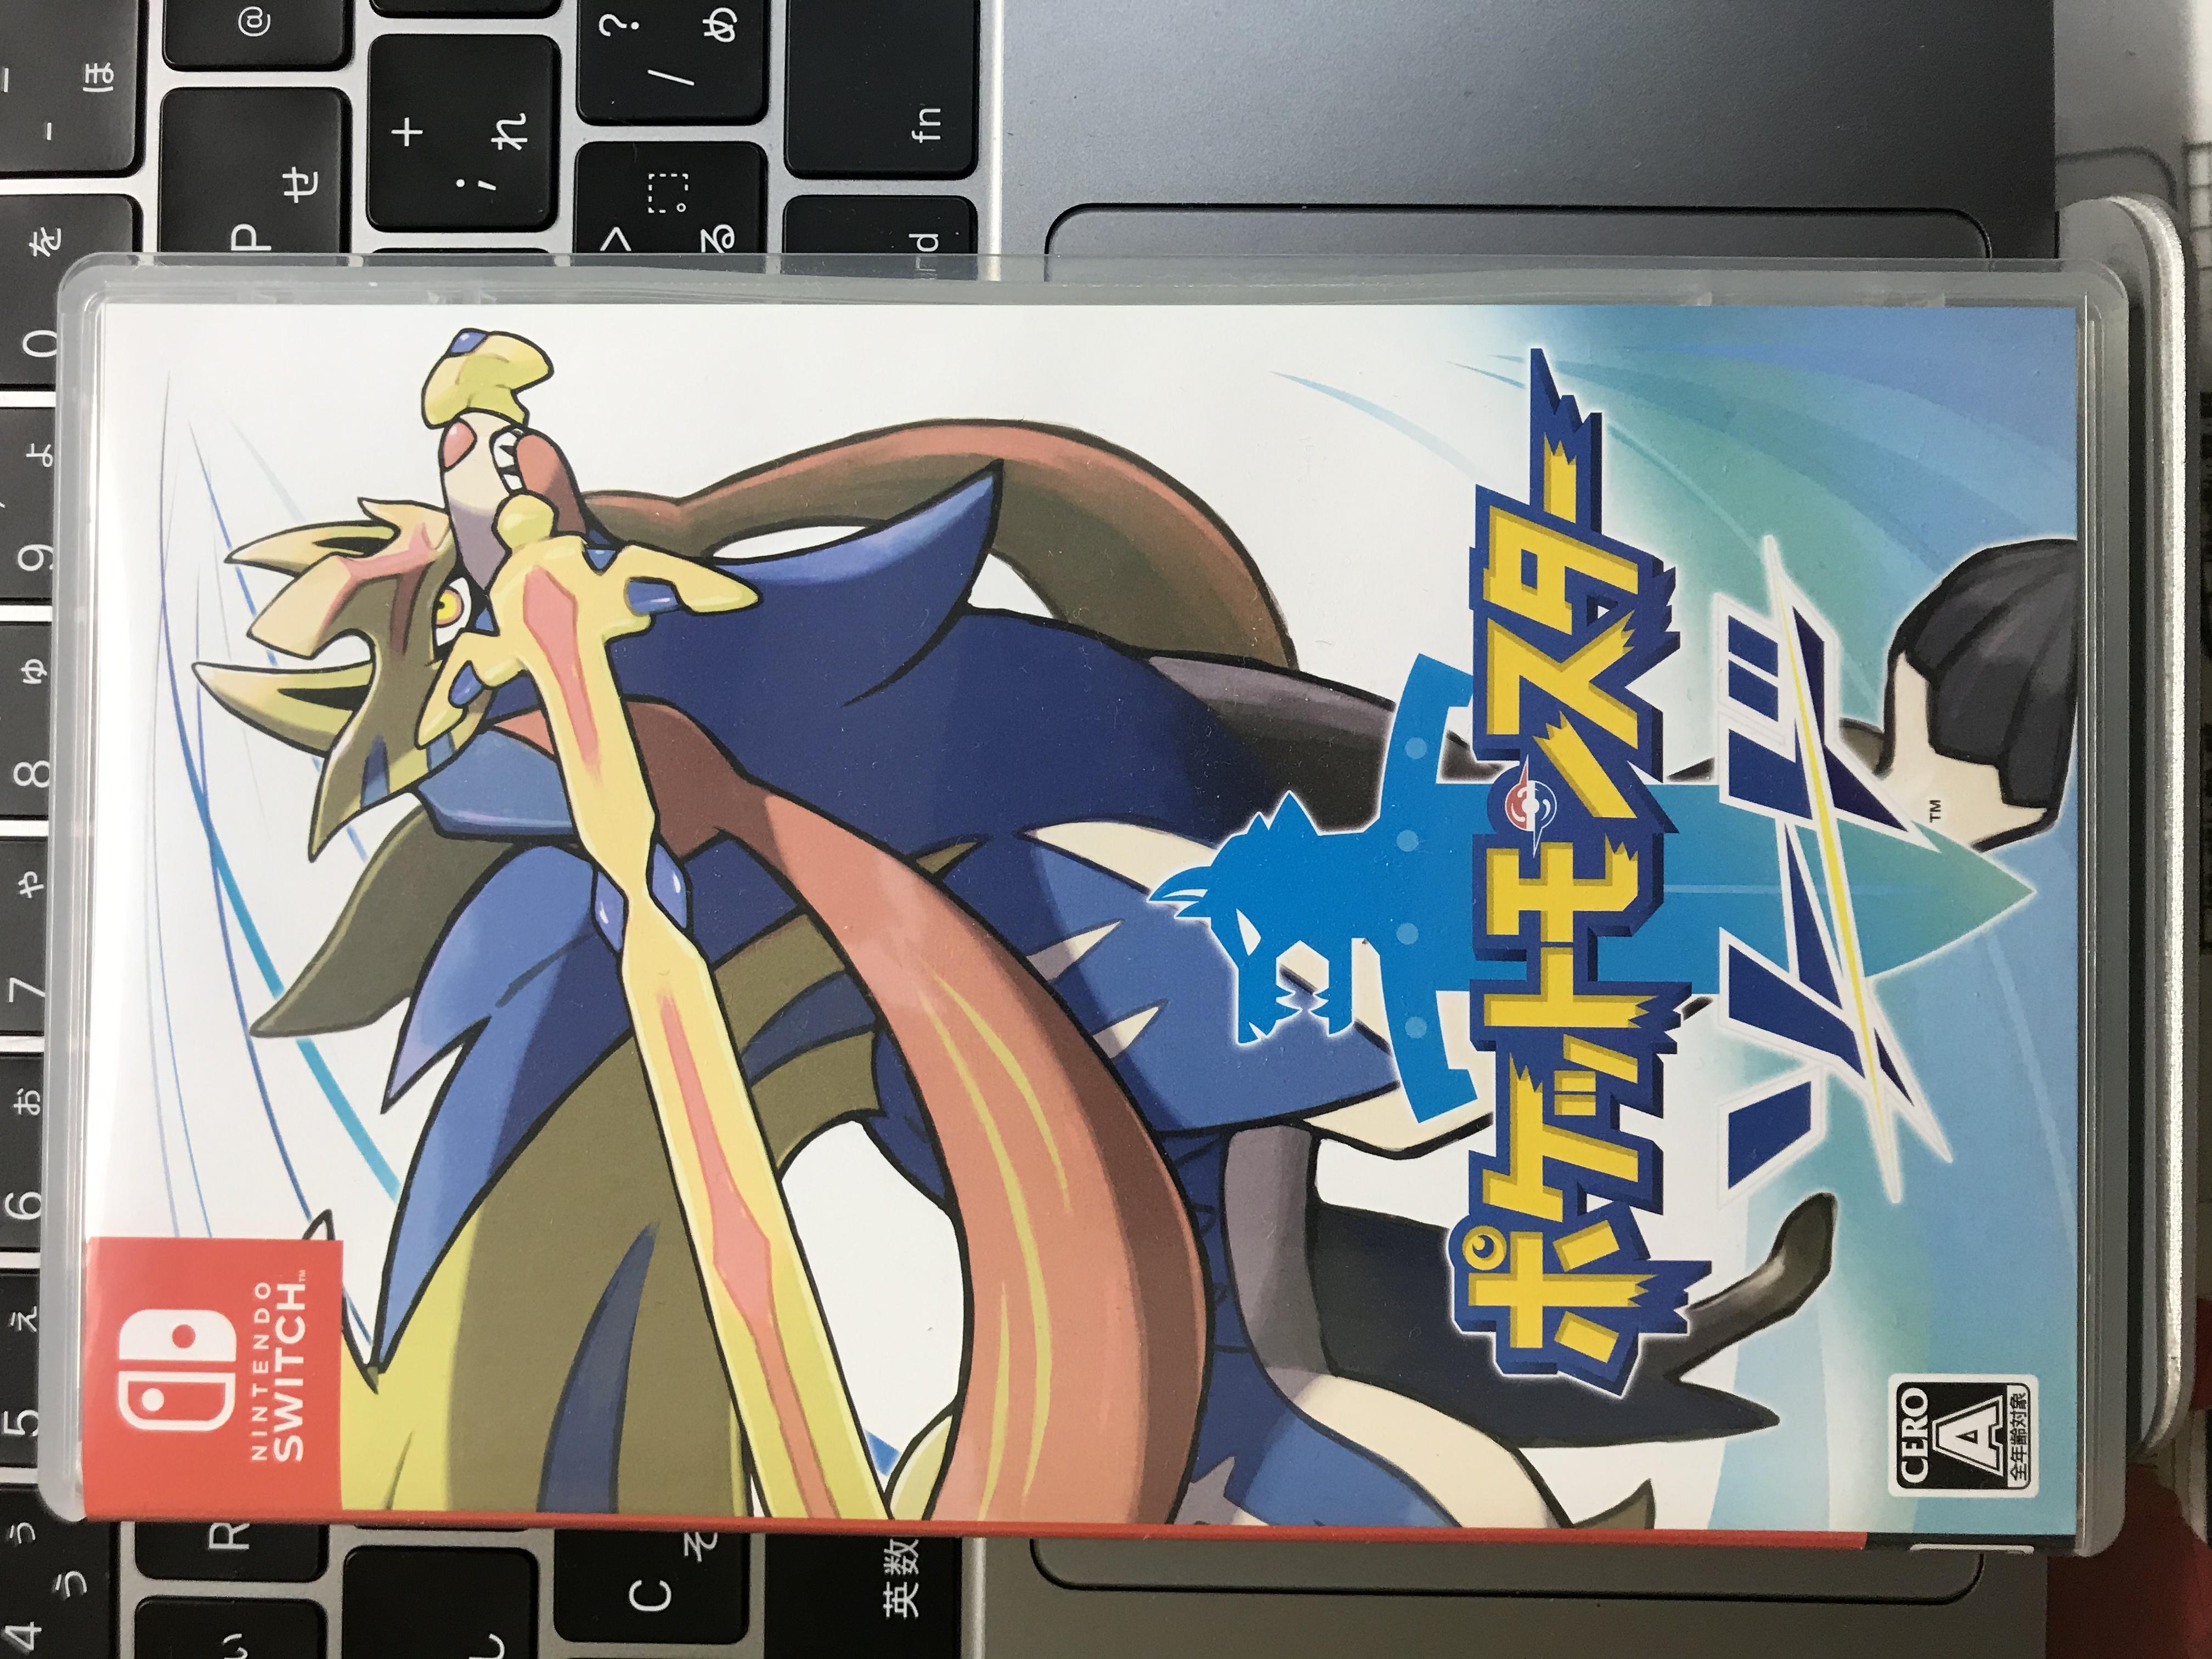 Thumbnail of ポケットモンスター ソード